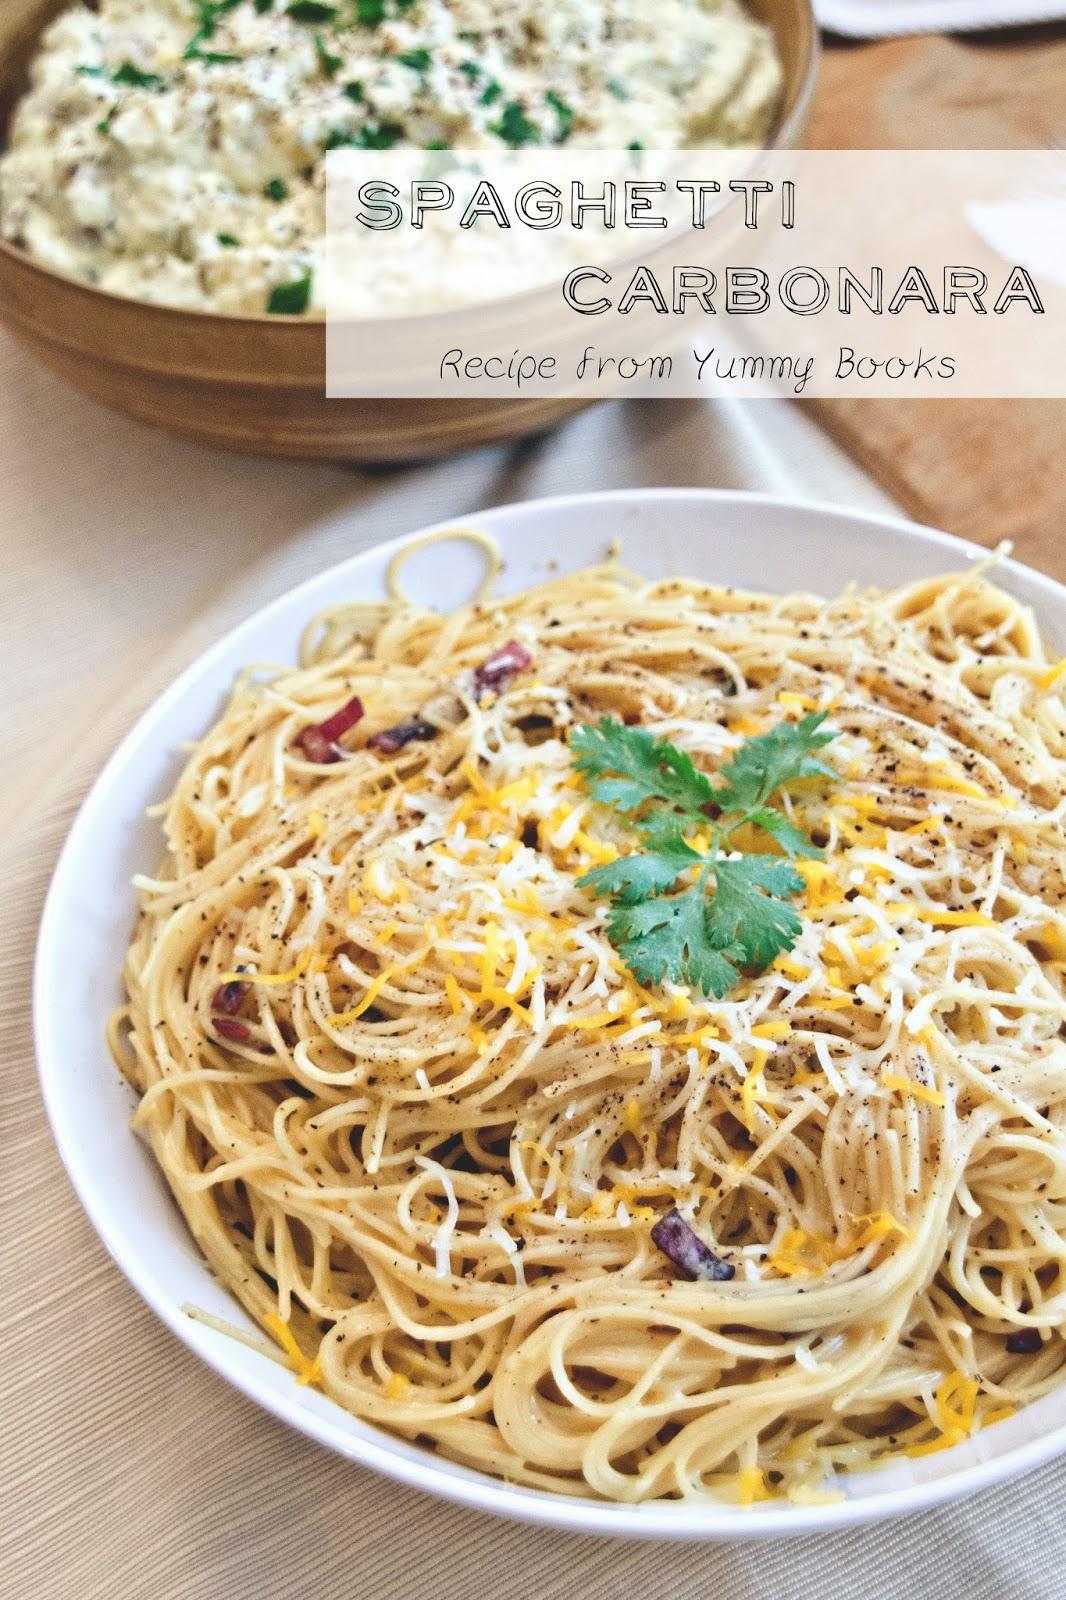 Spaghetti carbonara, yummy books, food for the goldfinch